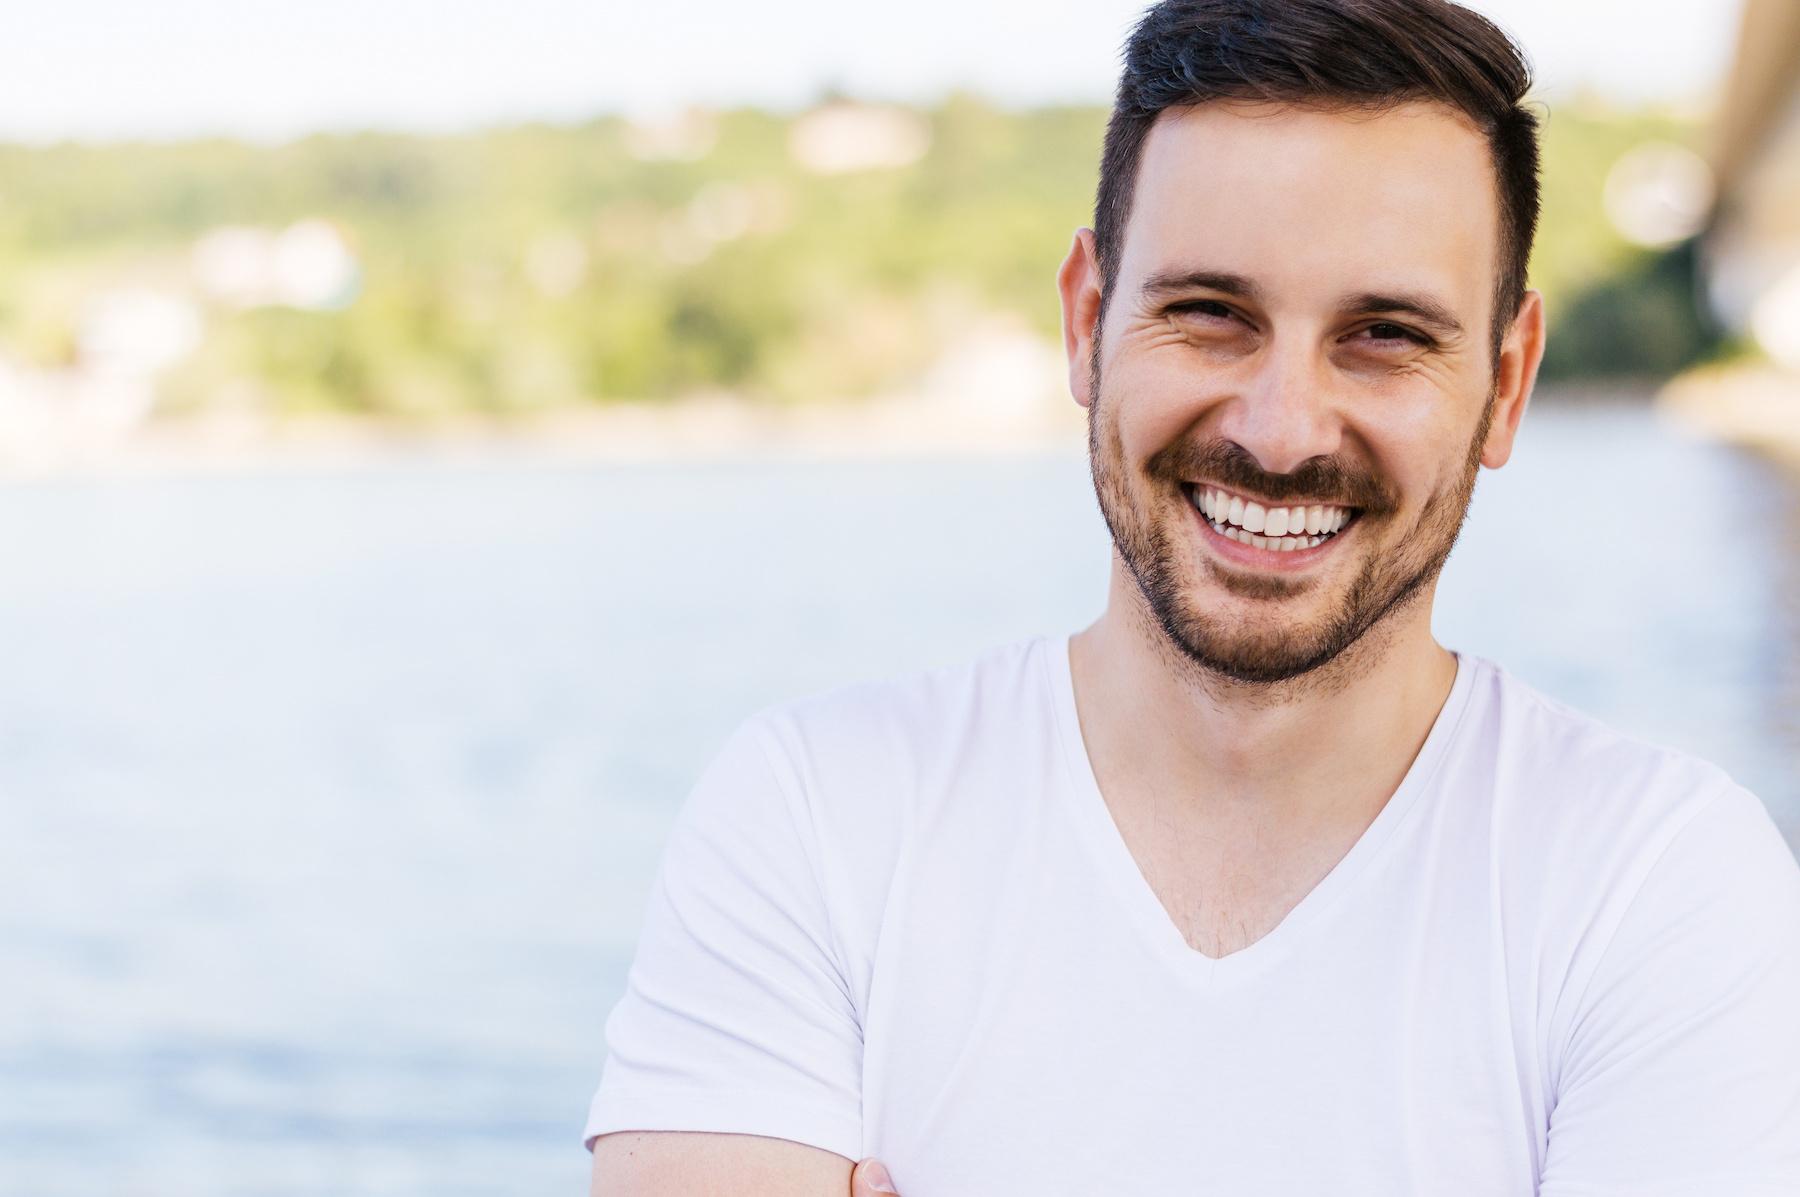 Man smiling after dental bonding treatment